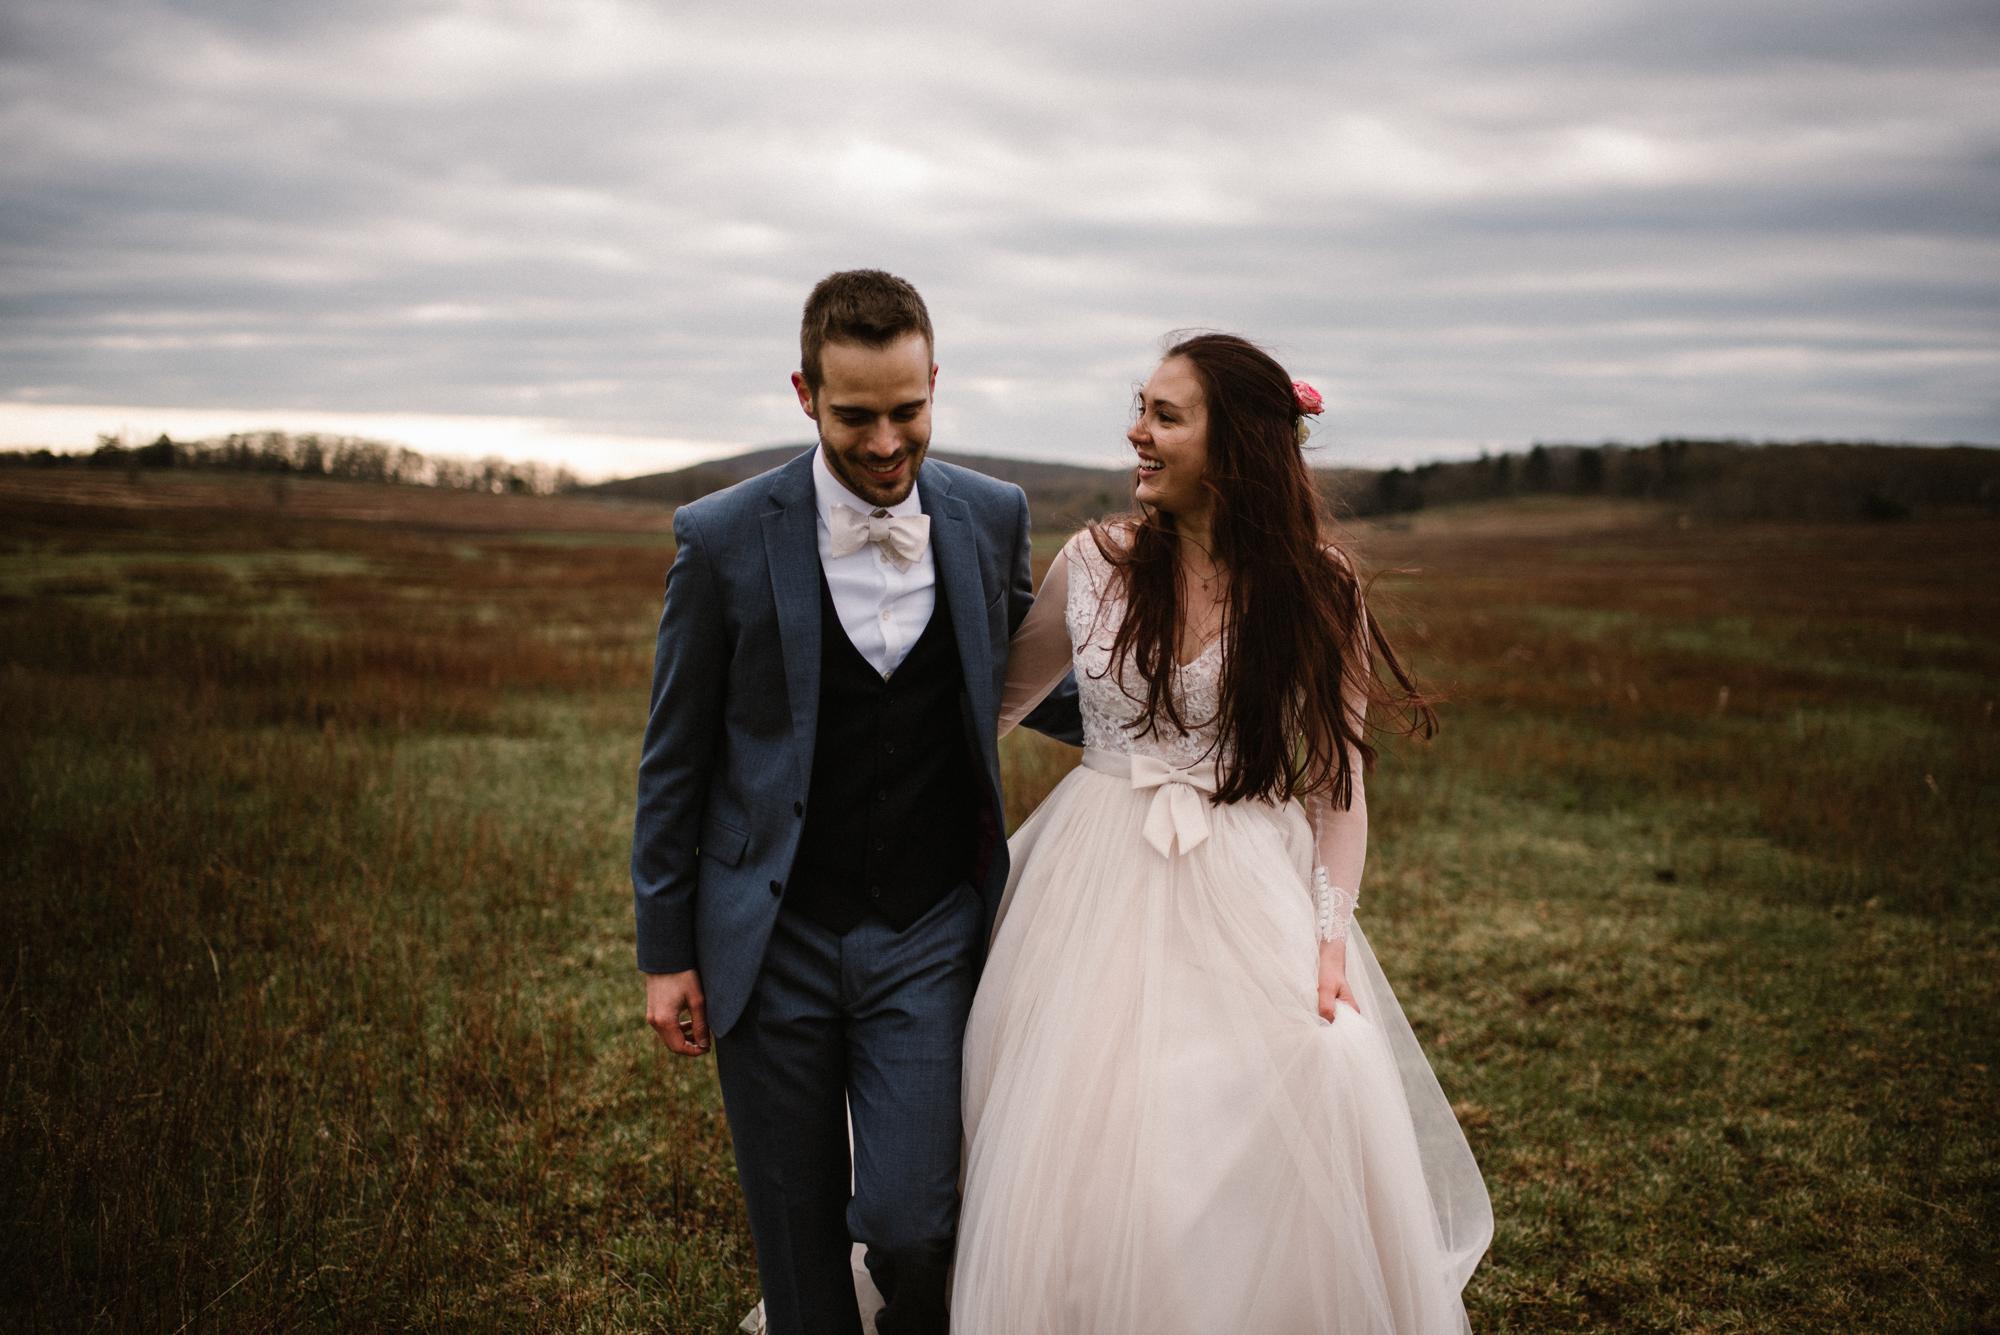 Paula and Andrew - Small Adventurous Wedding in Shenandoah National Park - Blue Ridge Mountain Wedding - White Sails Creative - Mountain Elopement_37.jpg